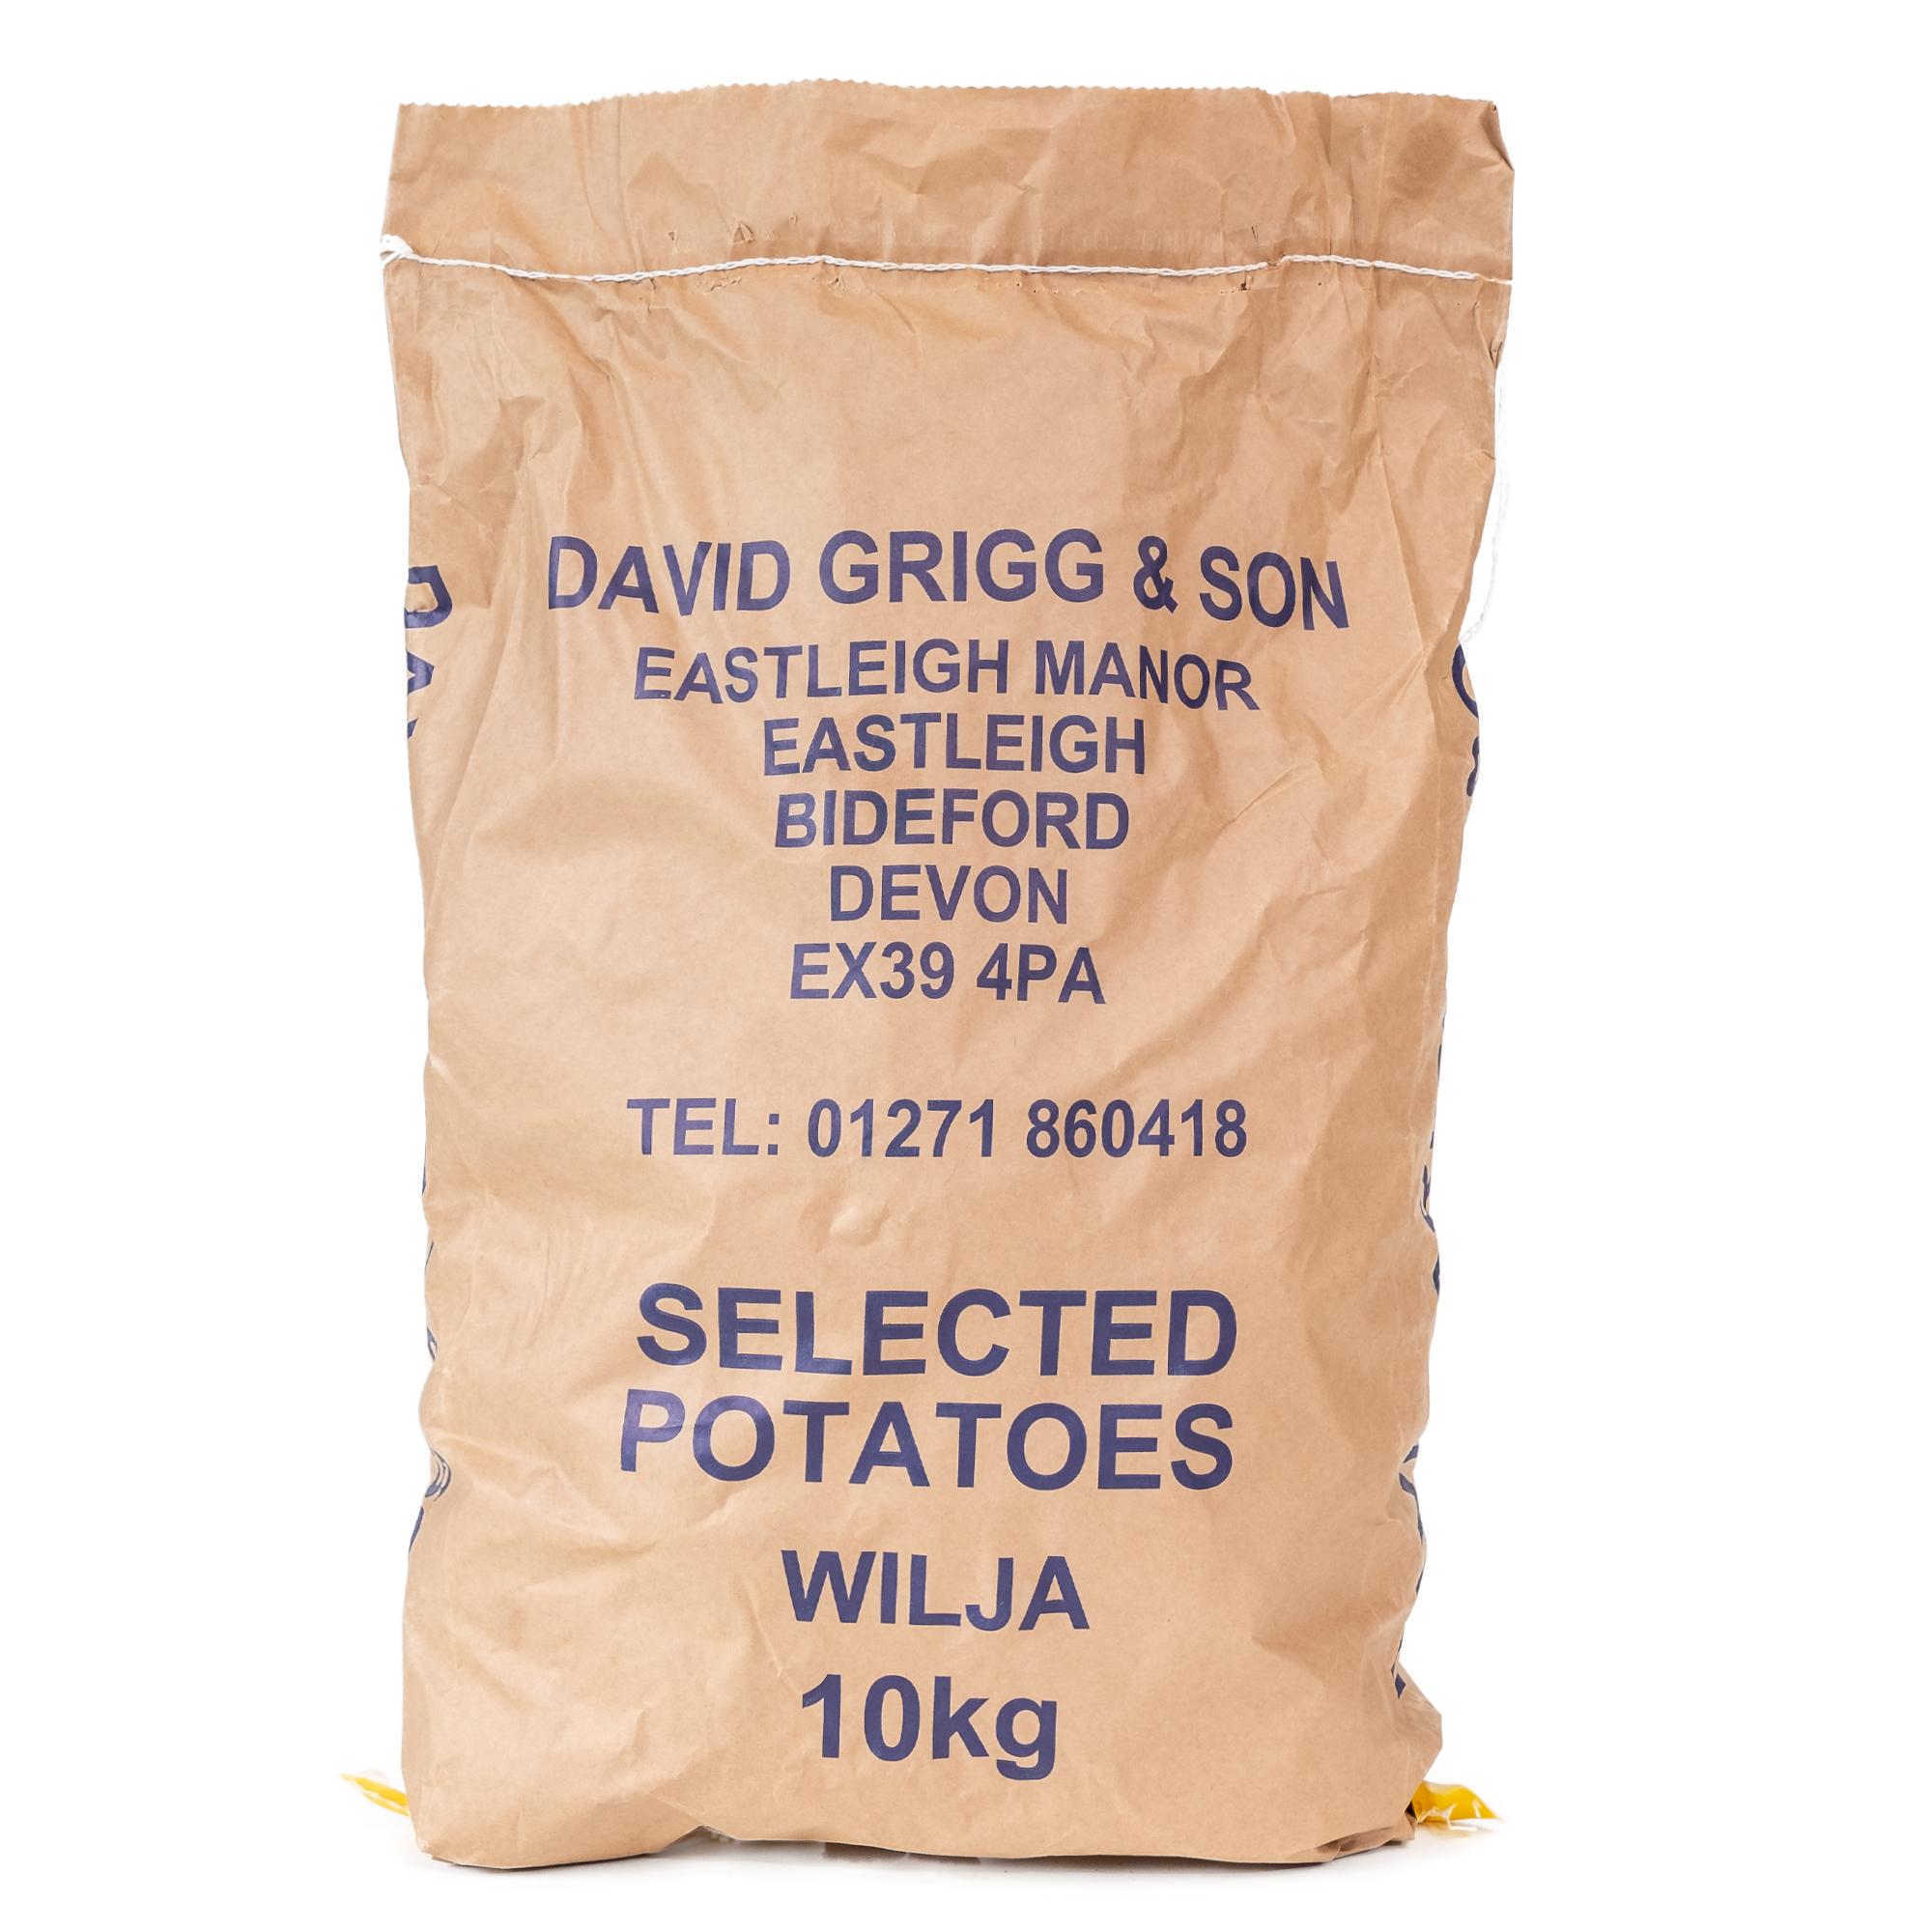 Potatoes - 10kg